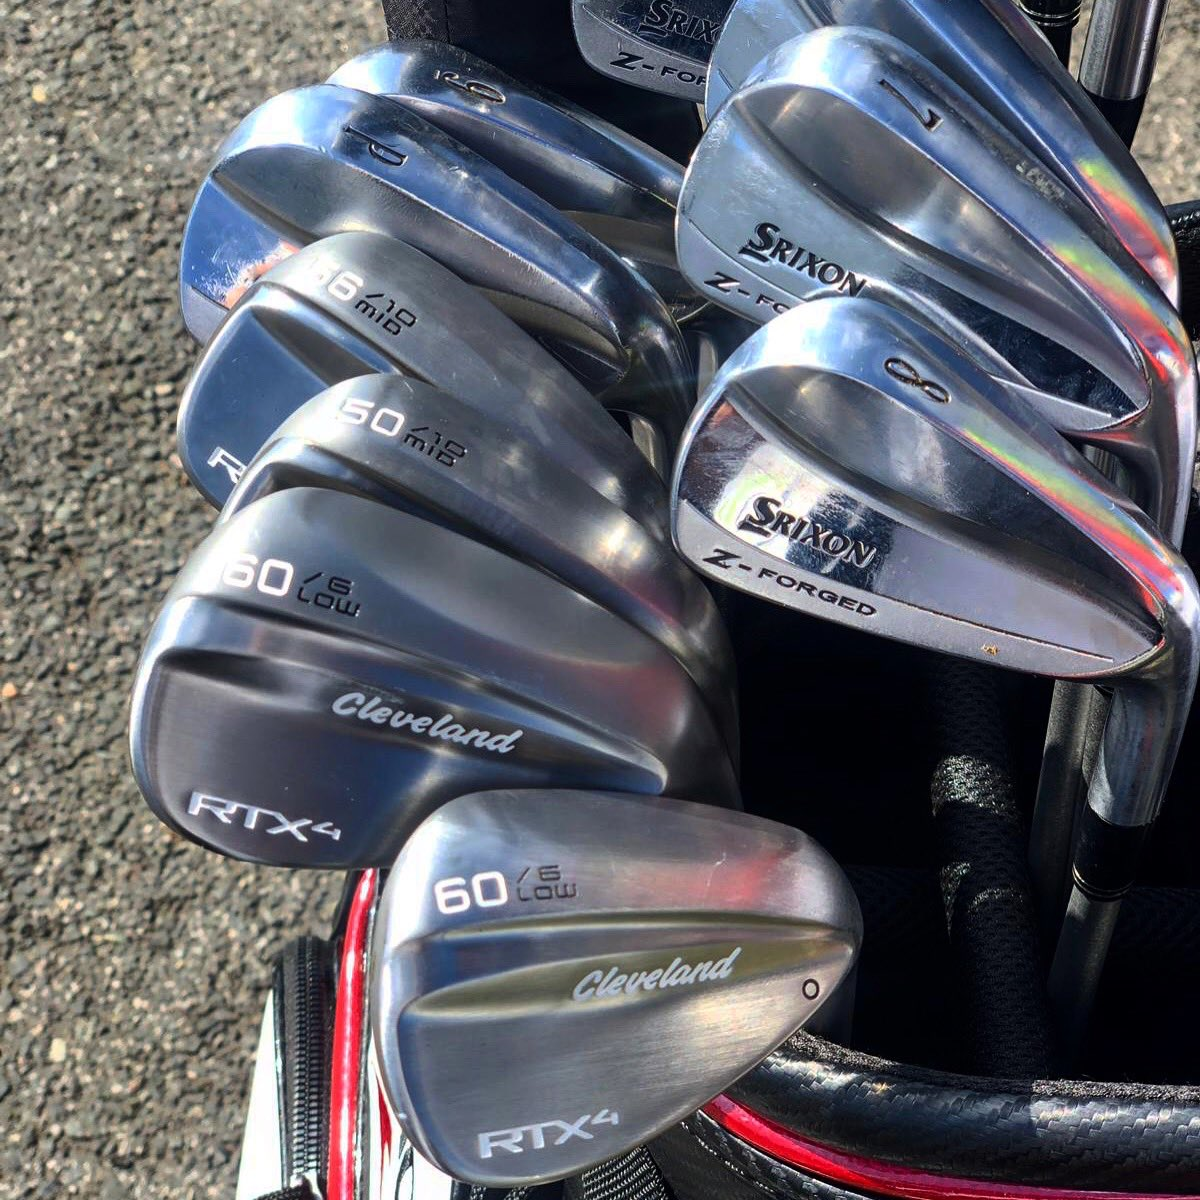 Crisp new wedges in the bag this week 🥳🥳 #europeantour #golfer #golf #srixon #Cleveland